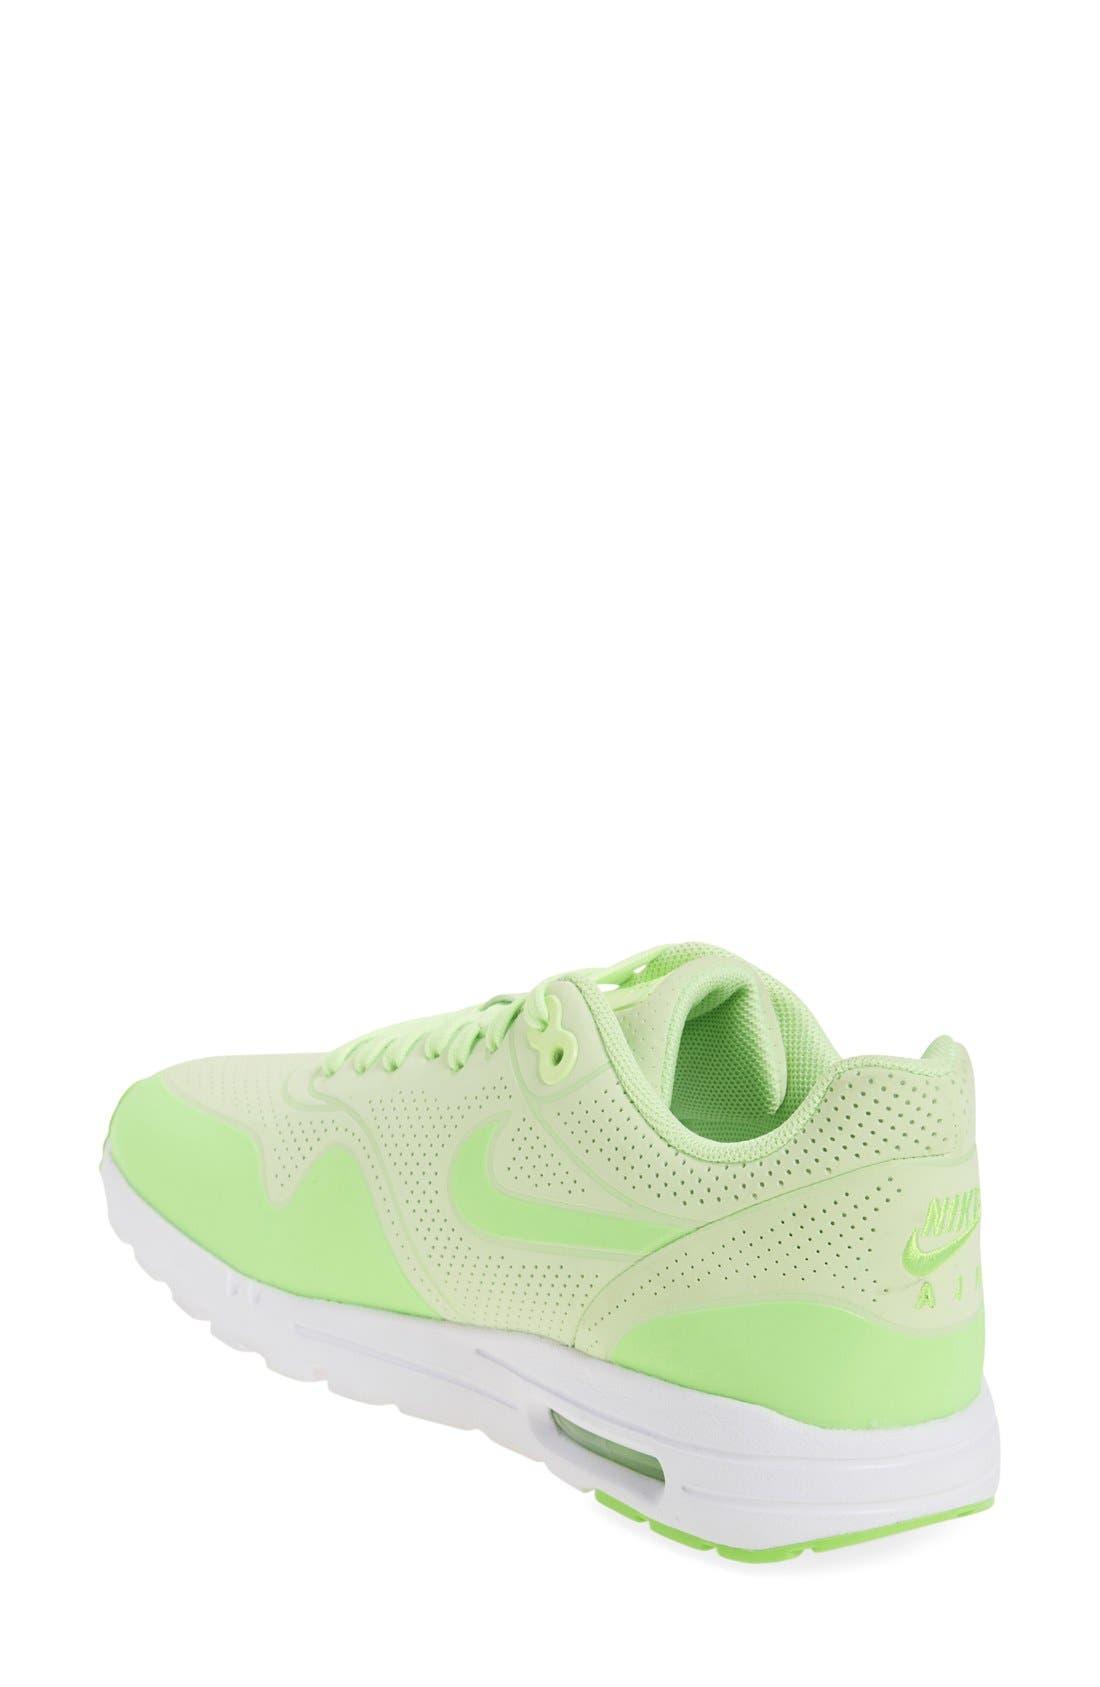 ,                             'Air Max 1 - Ultra Moire' Sneaker,                             Alternate thumbnail 52, color,                             302